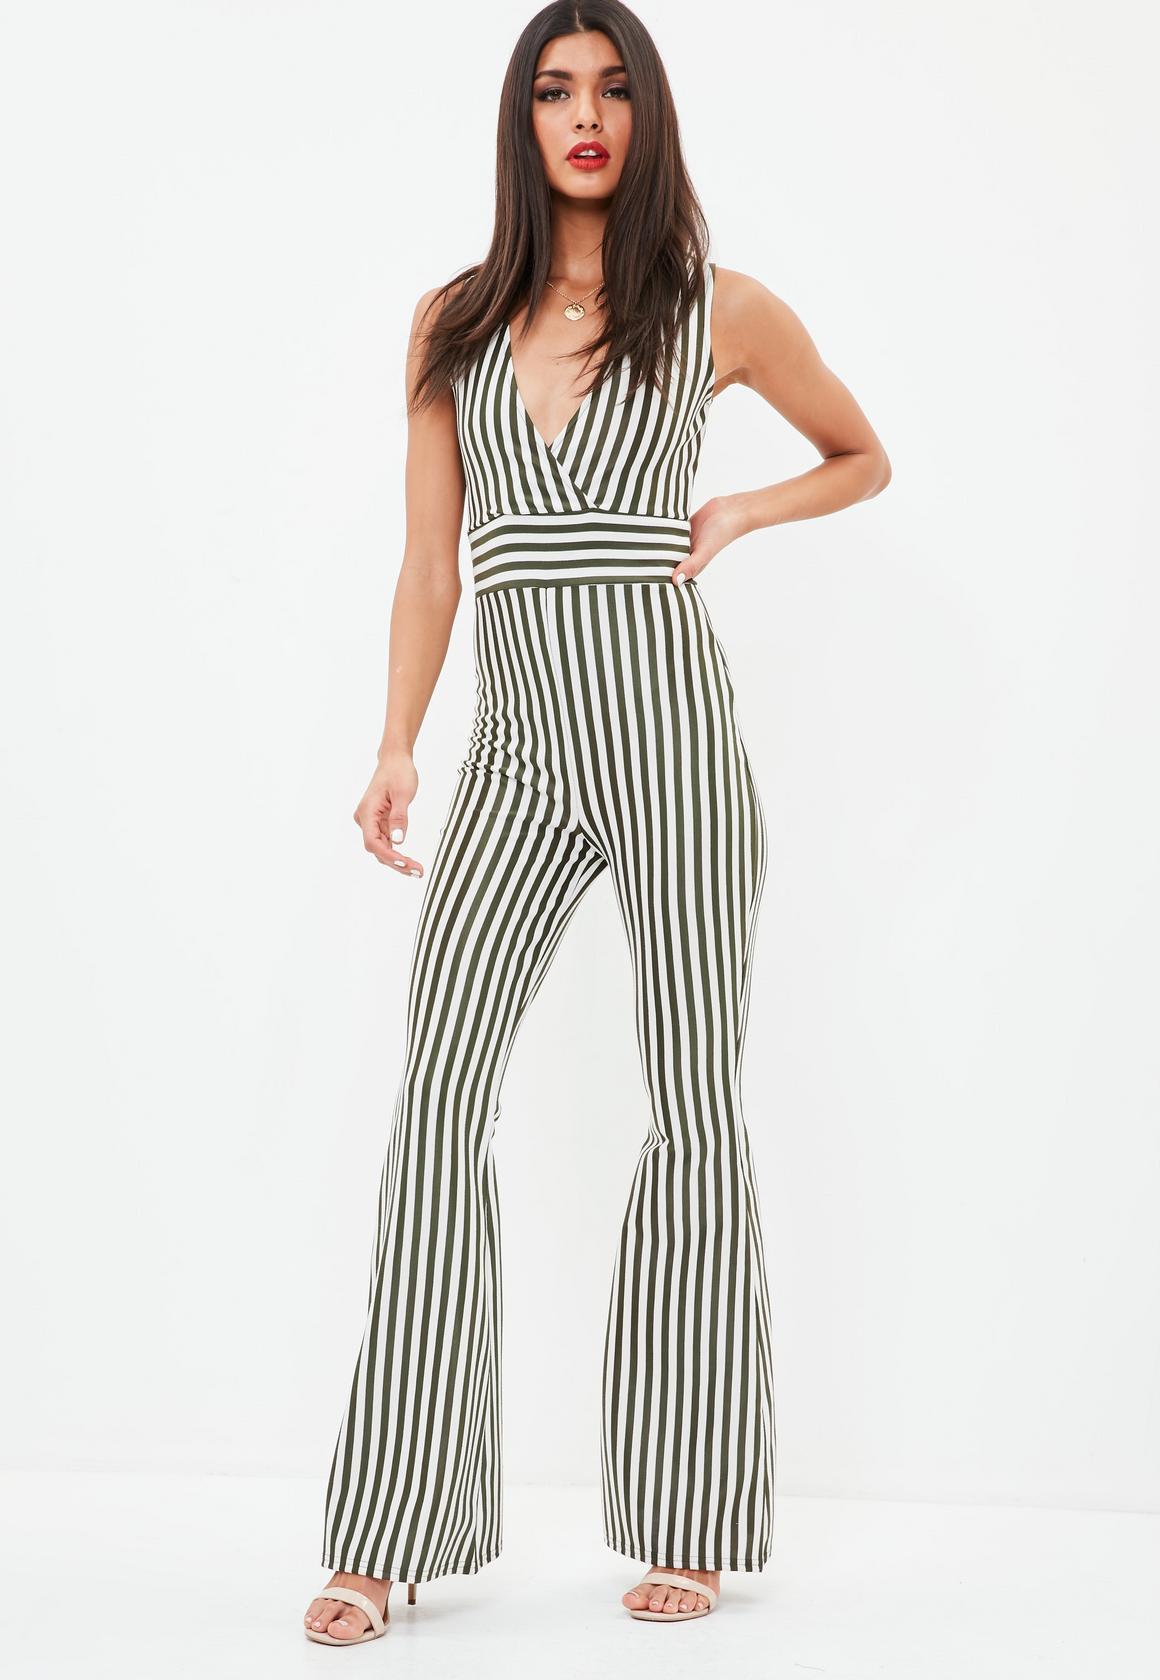 Shop online for Khaki Sleeveless Stripe Kick Flare Jumpsuit